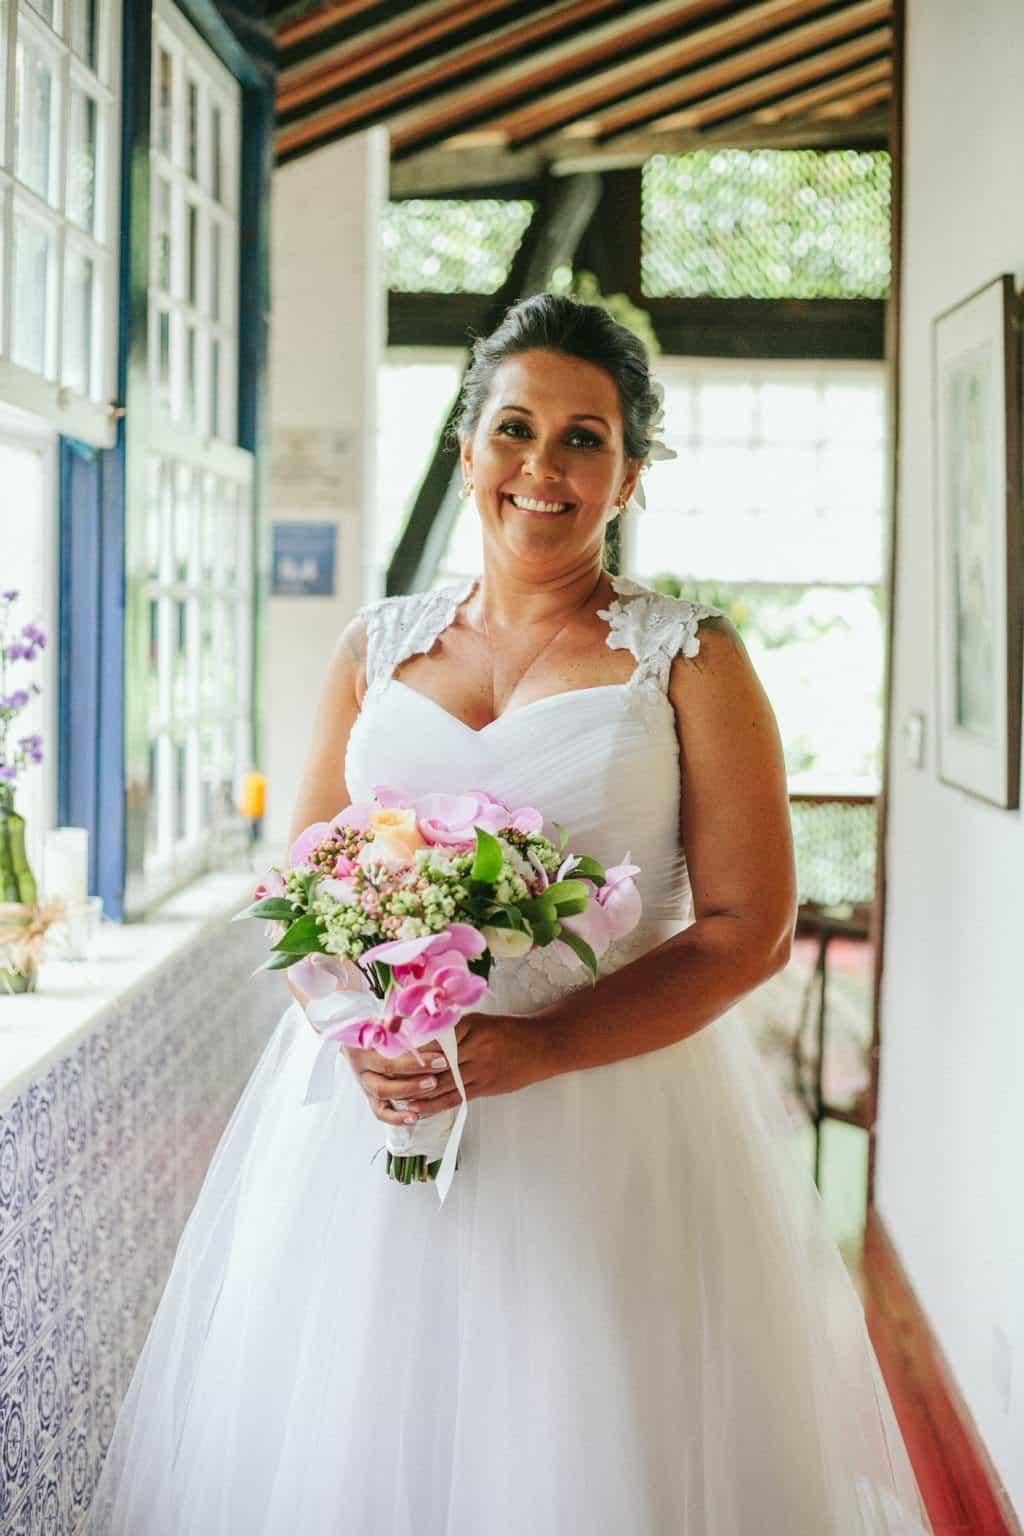 casamento-karina-e-marcos-felizes-para-sempre-caseme-19